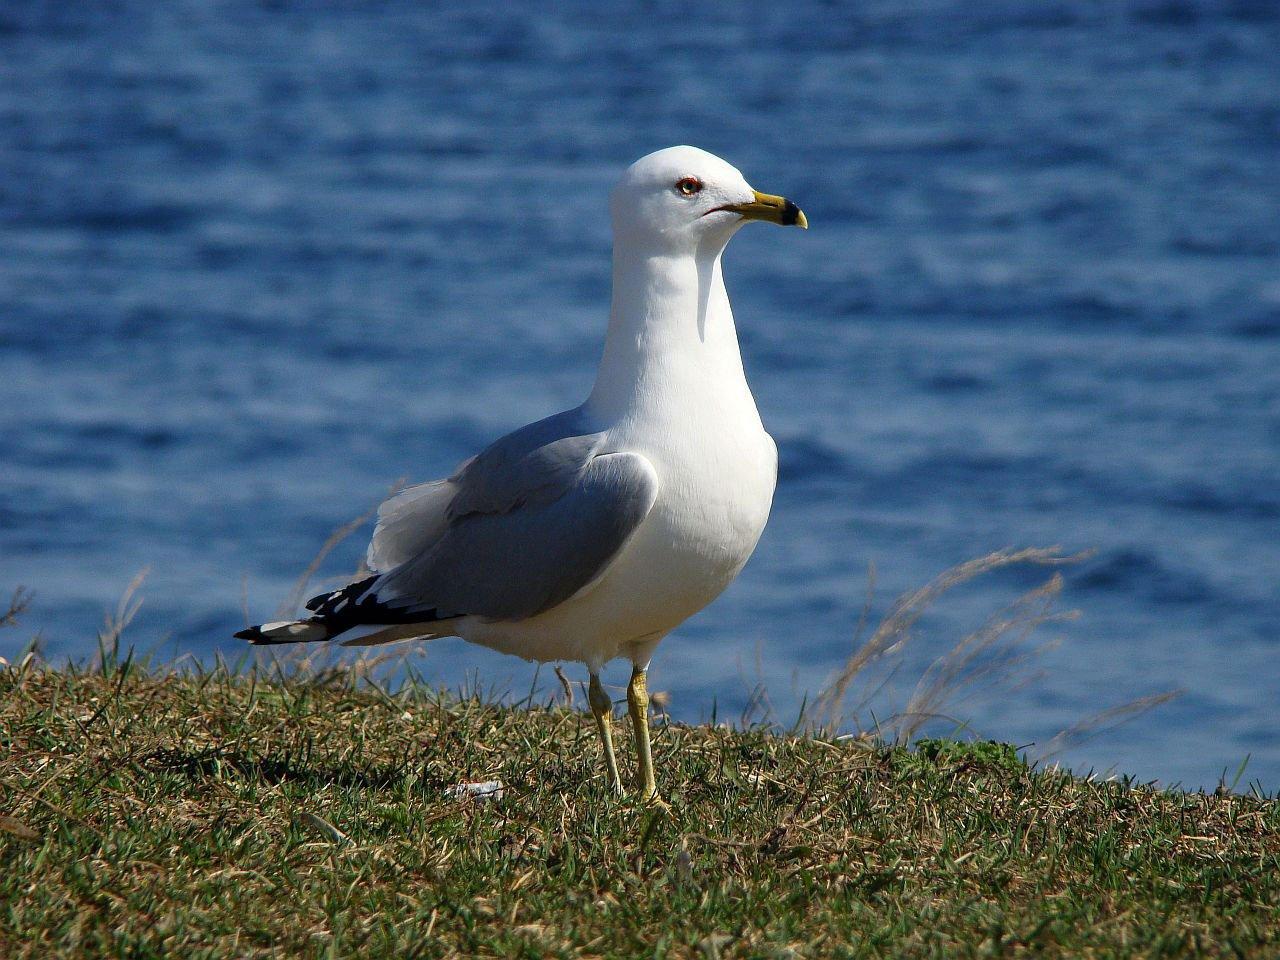 желаю, чайка фото птица моя